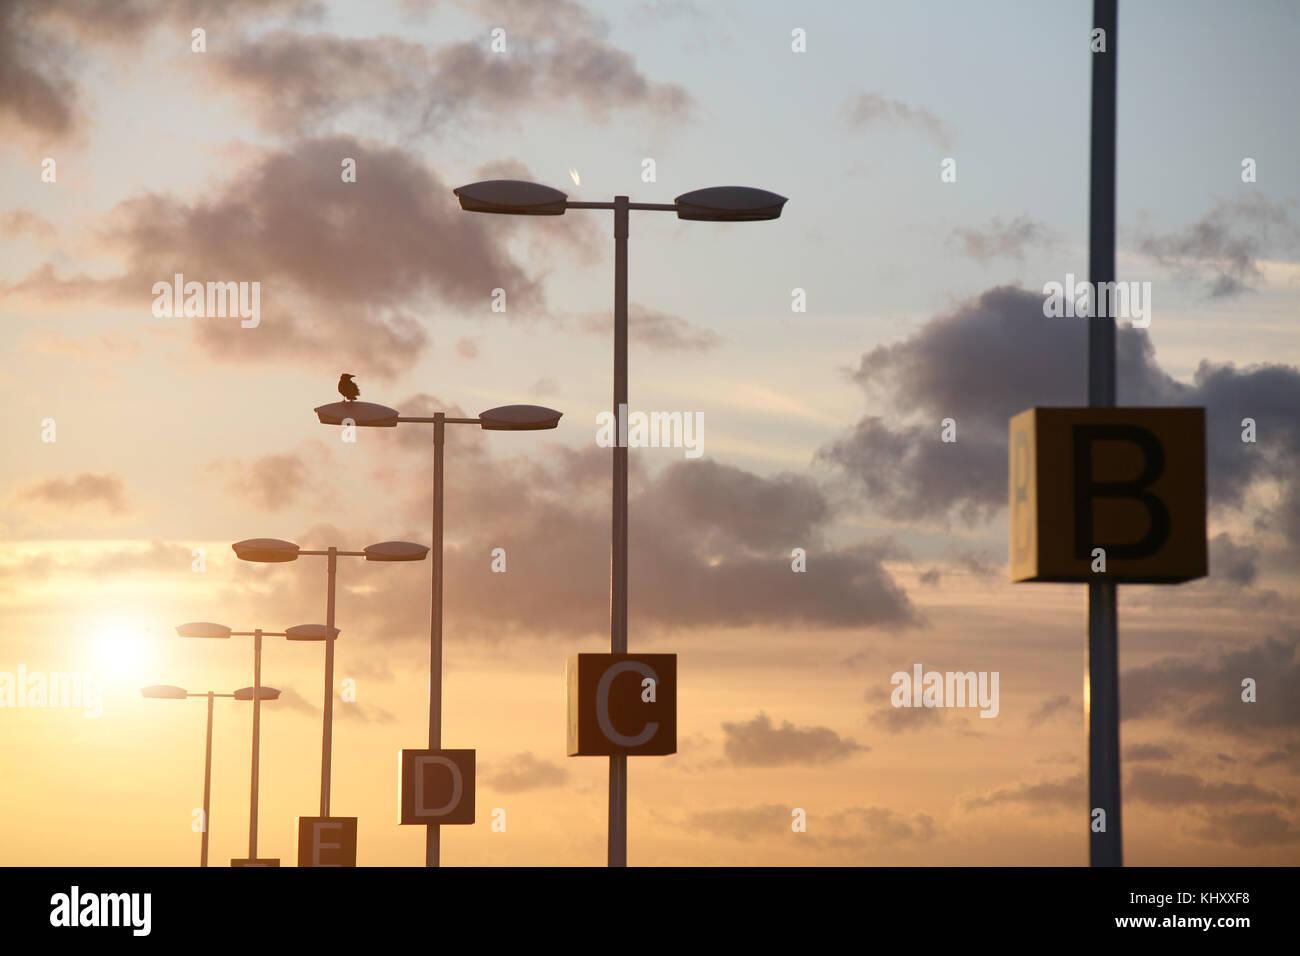 Capital letters on lamppost at sunset, Frankfurt, Hessen, Germany, Europe - Stock Image